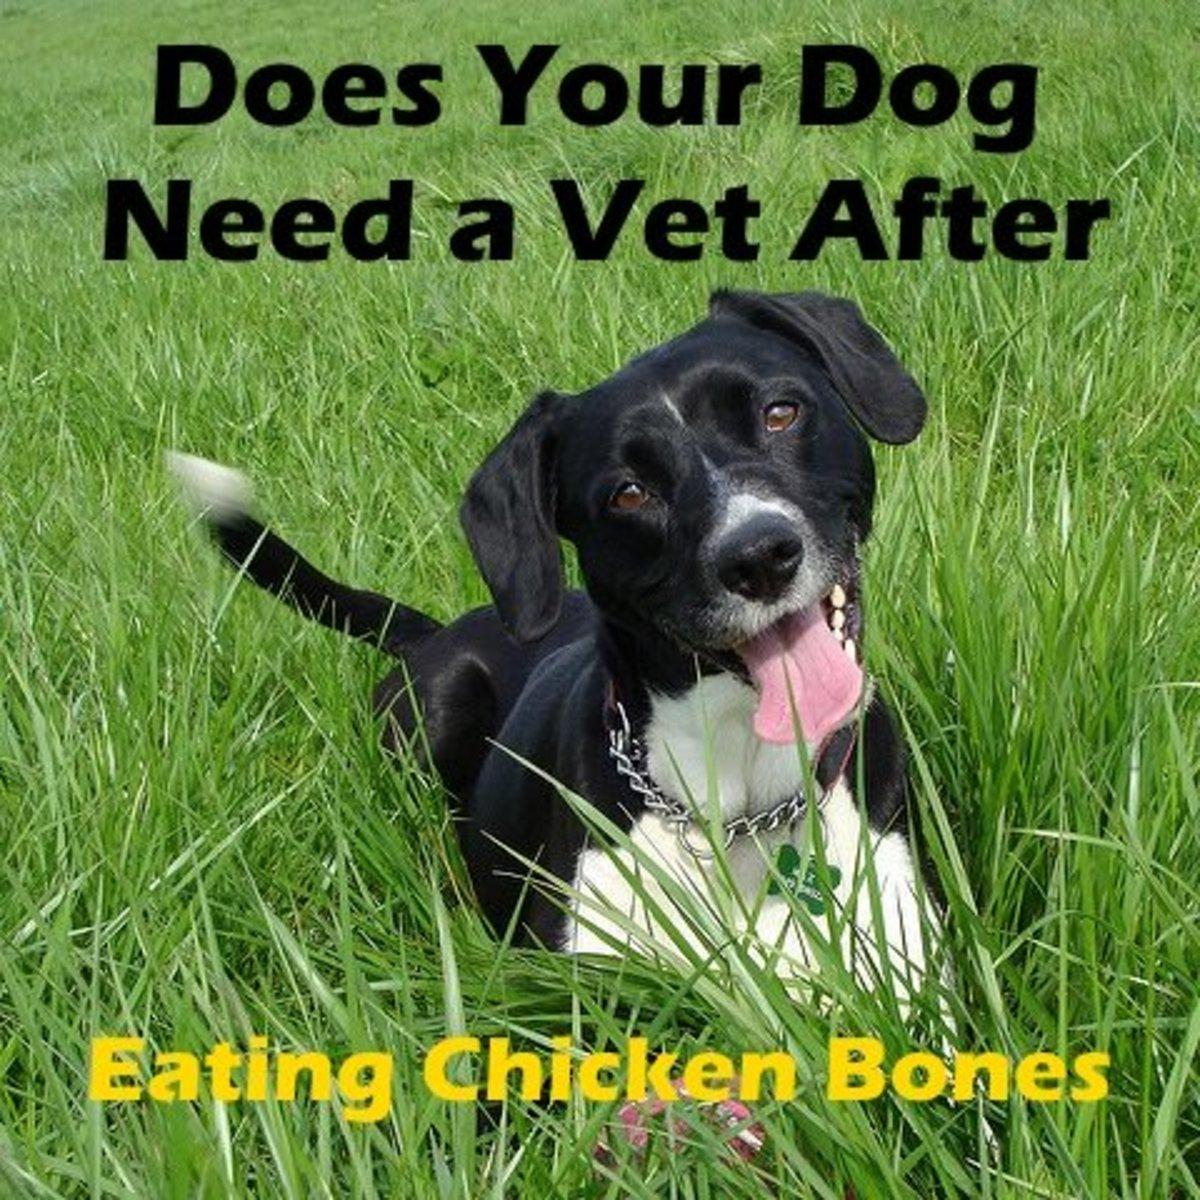 Vet After Eating a Chicken Bone